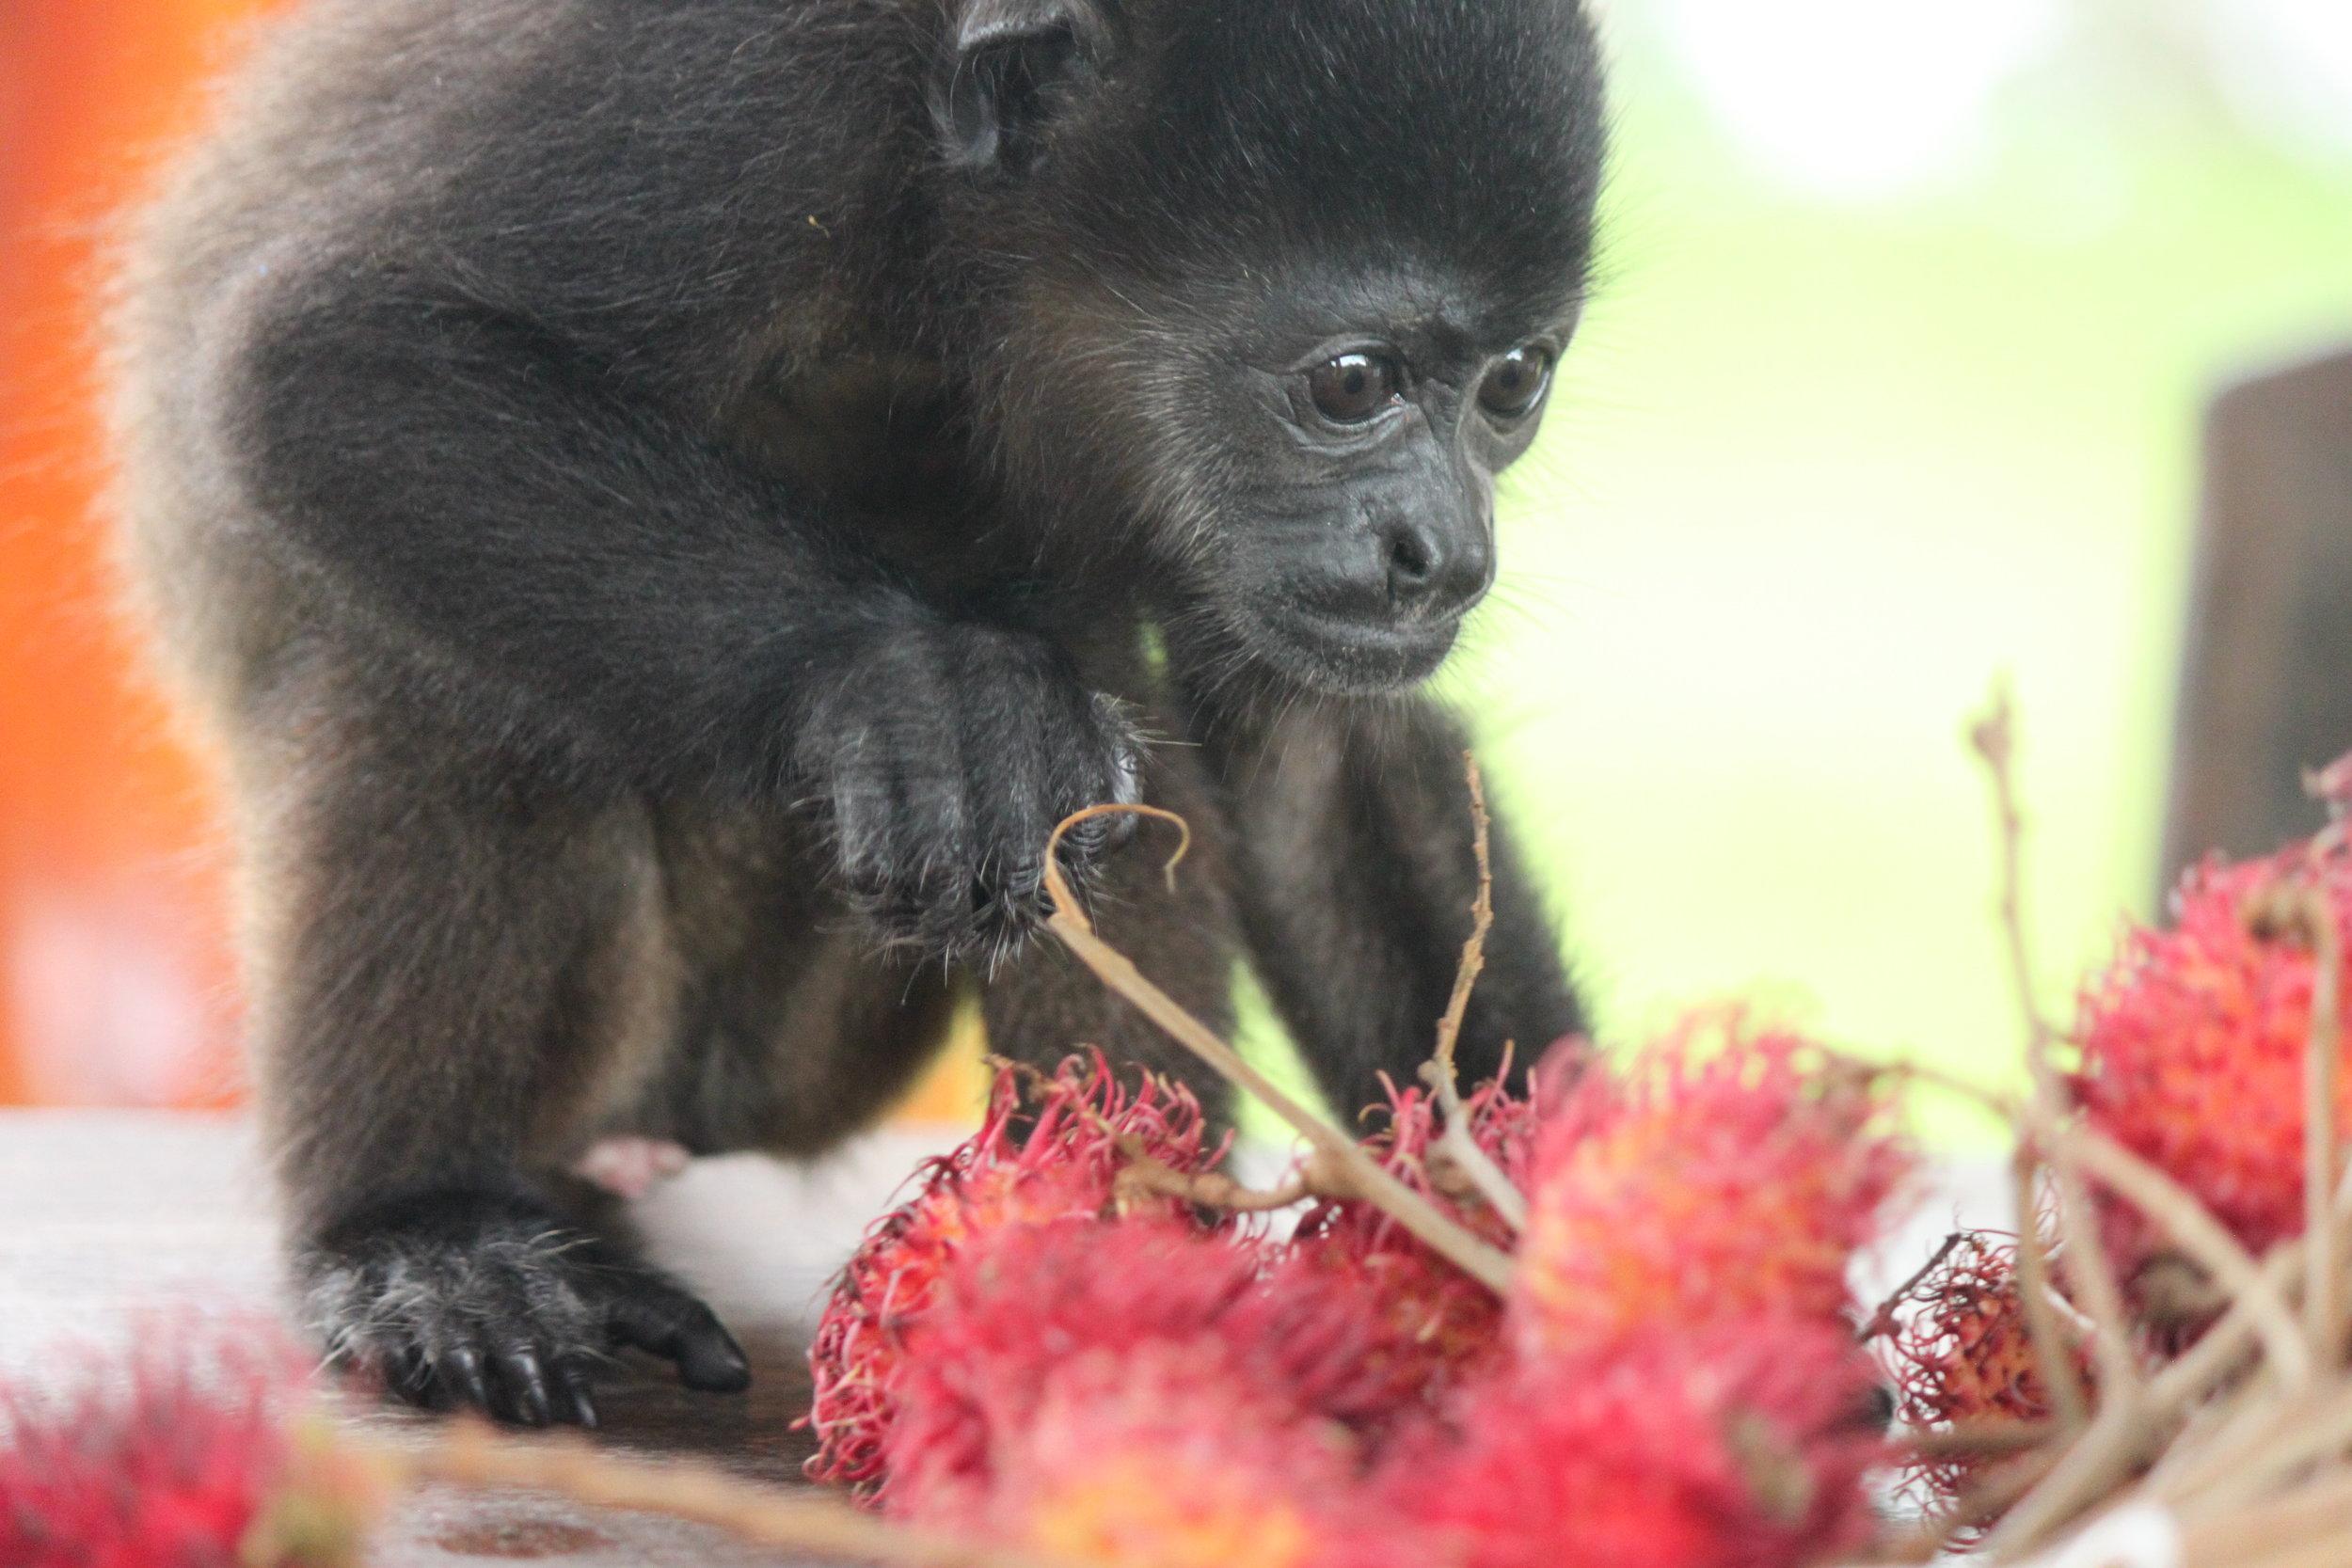 Infant Mantled Howler Monkey: Cheeto